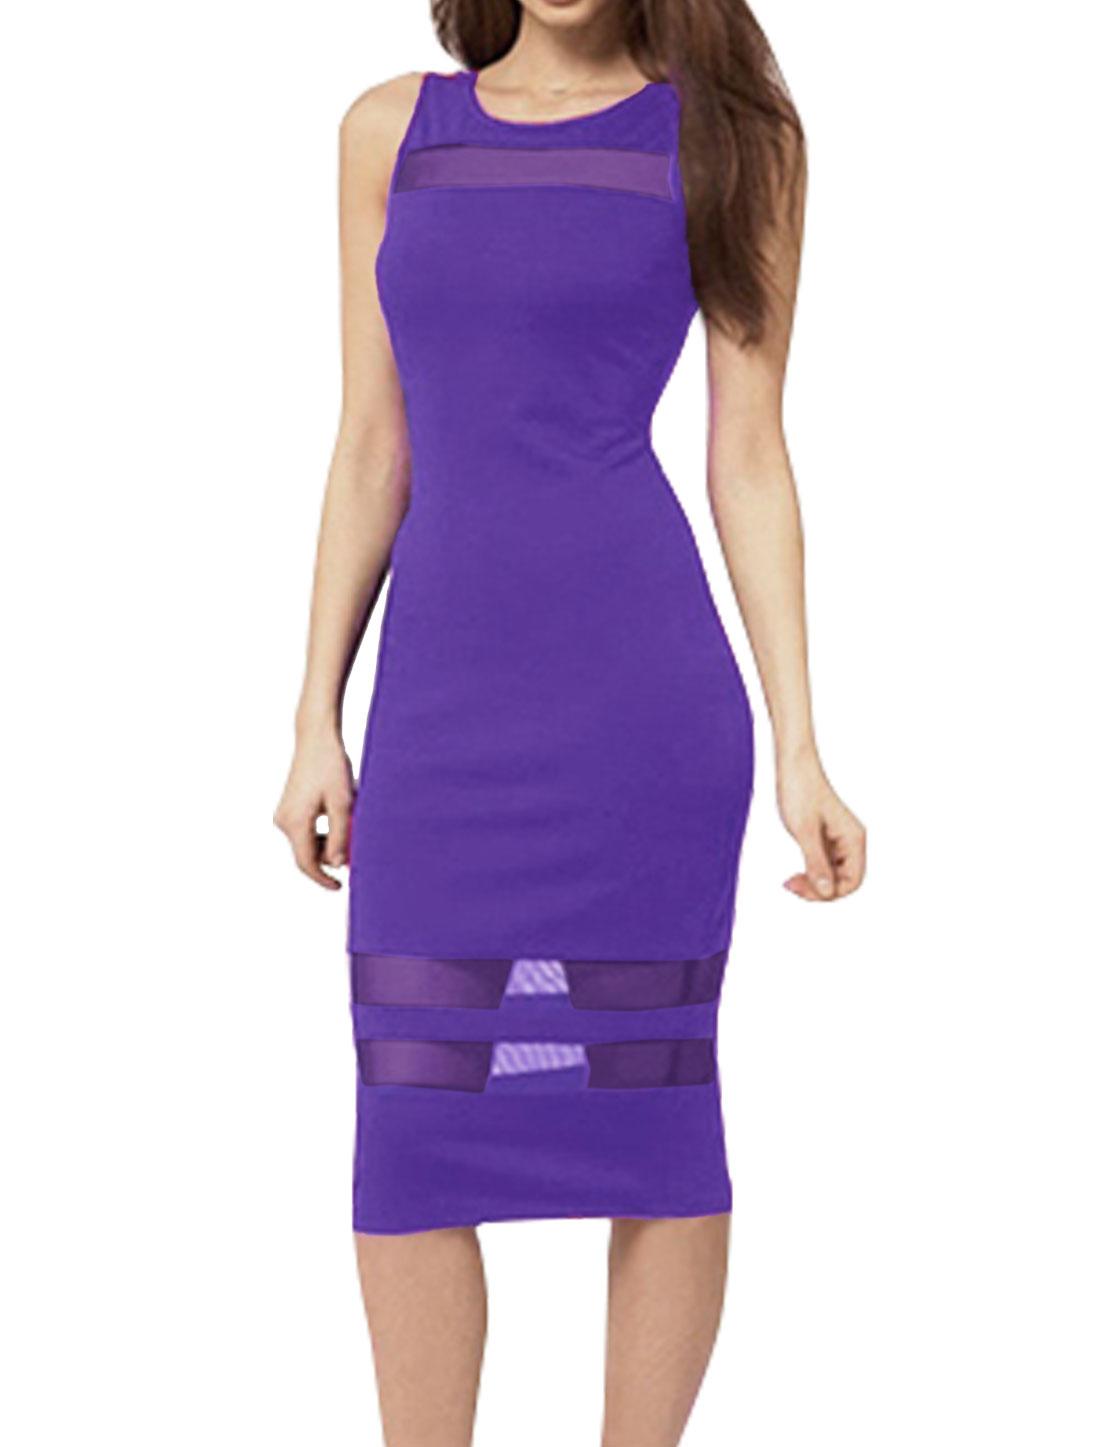 Women Sleeveless Open Back Mesh Panel Pencil Dress Purple XS